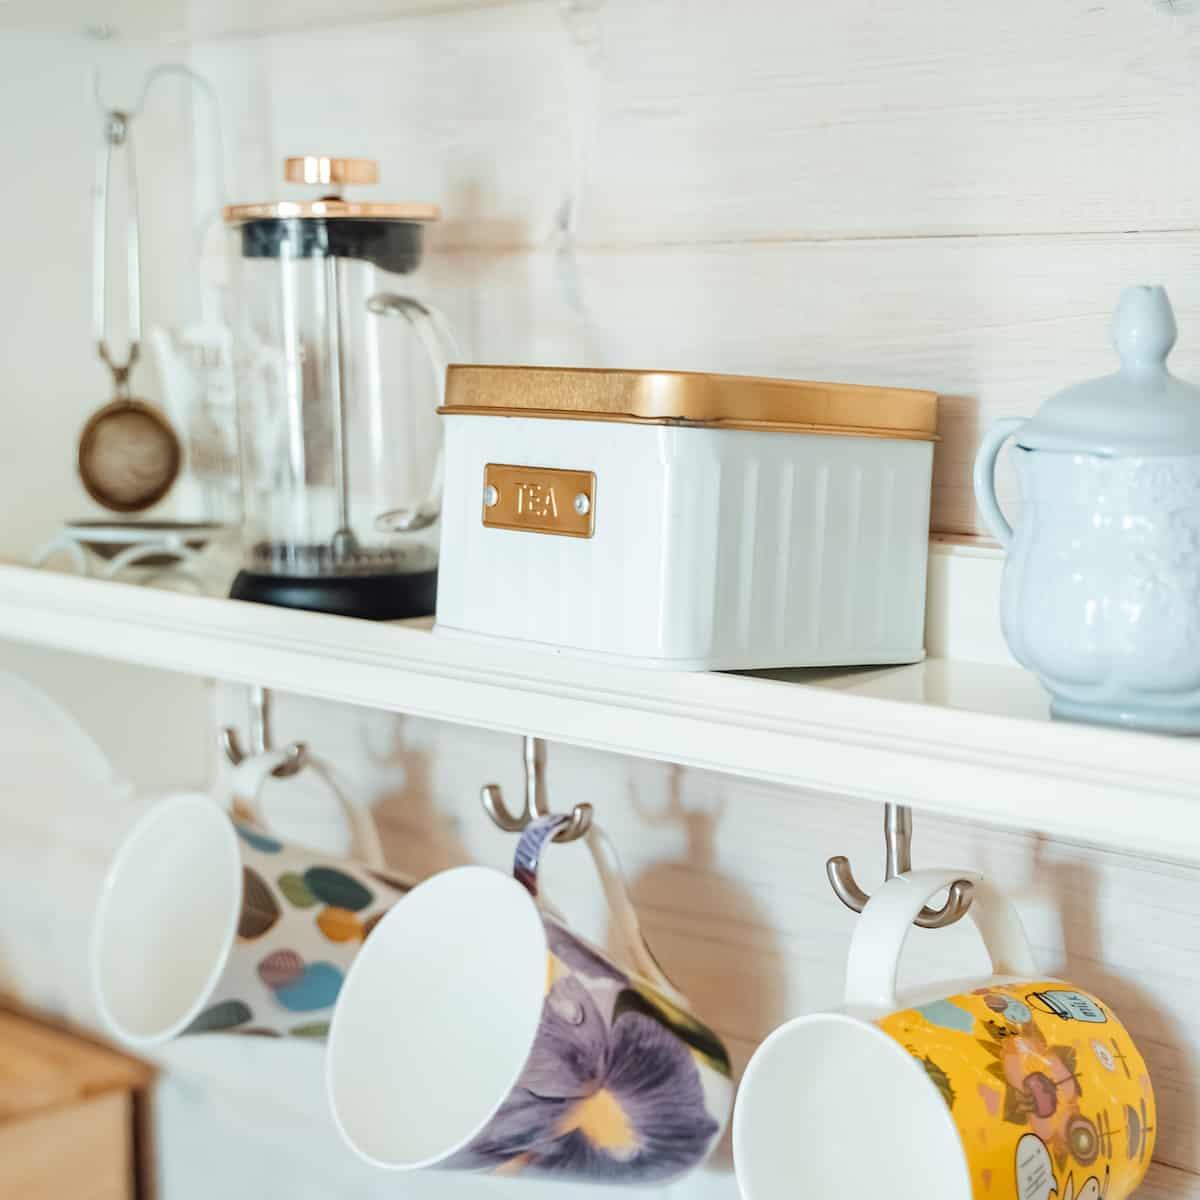 tea organizer on open shelf